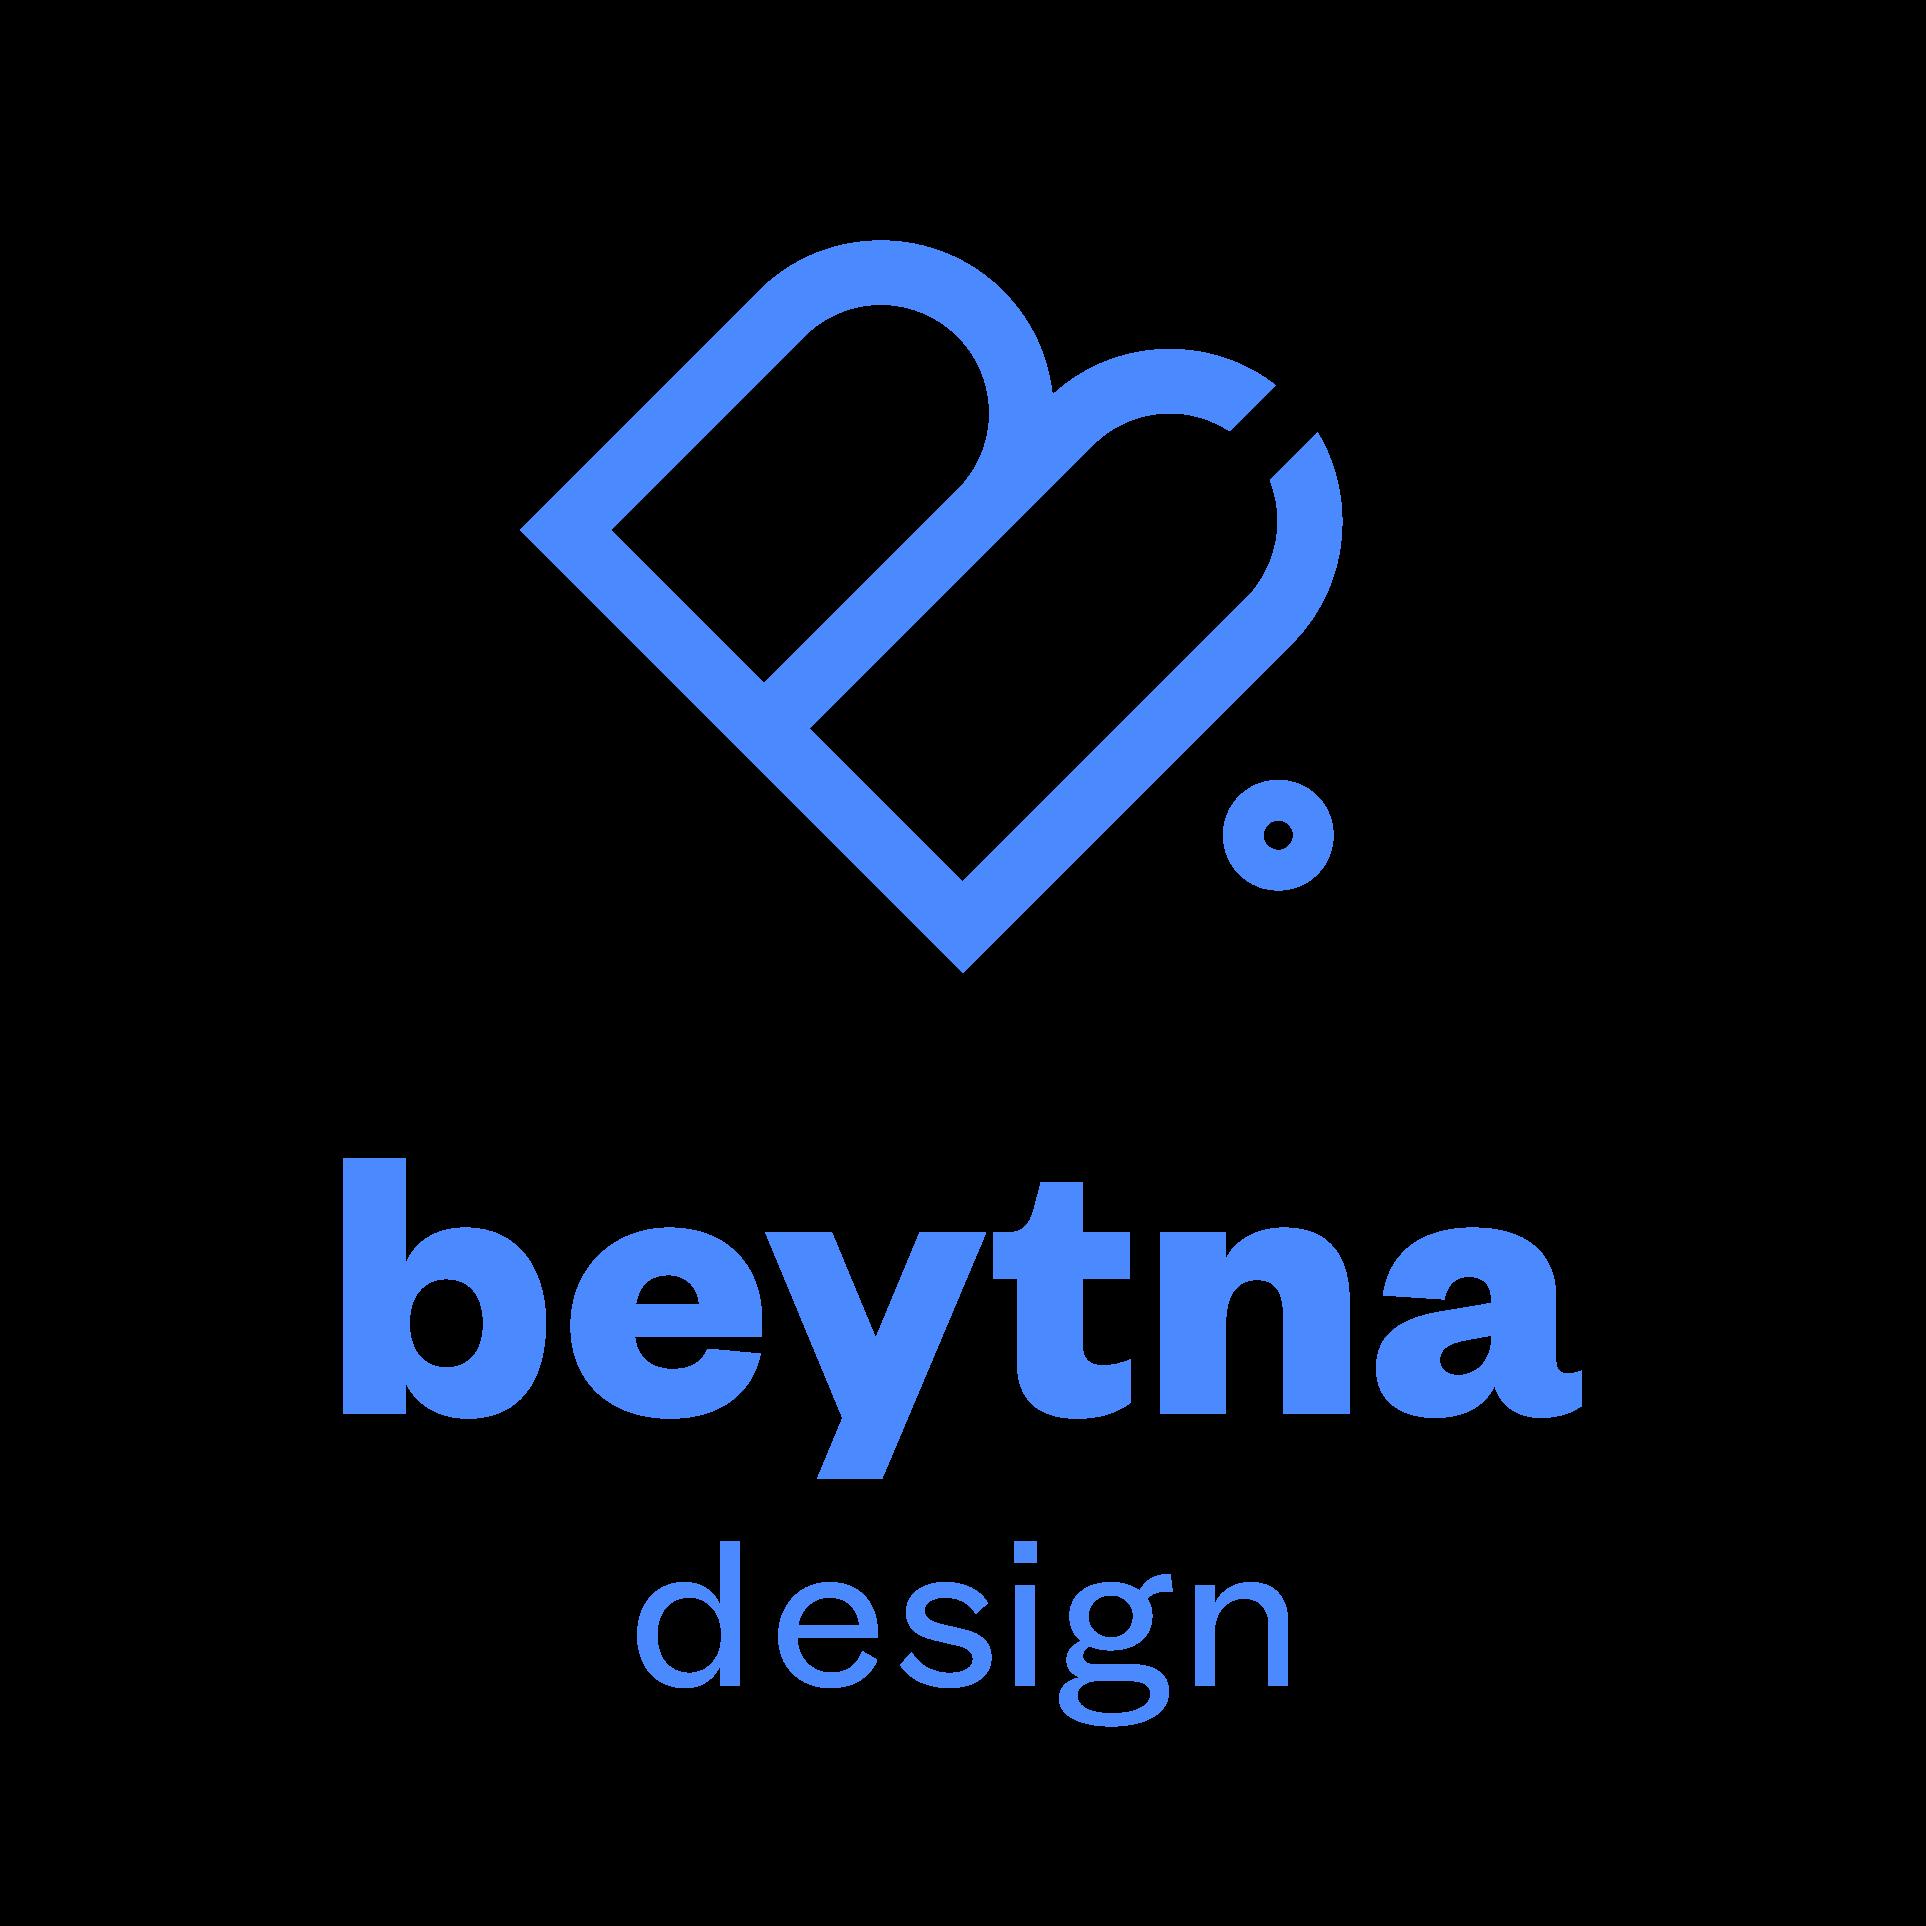 Beytna Design